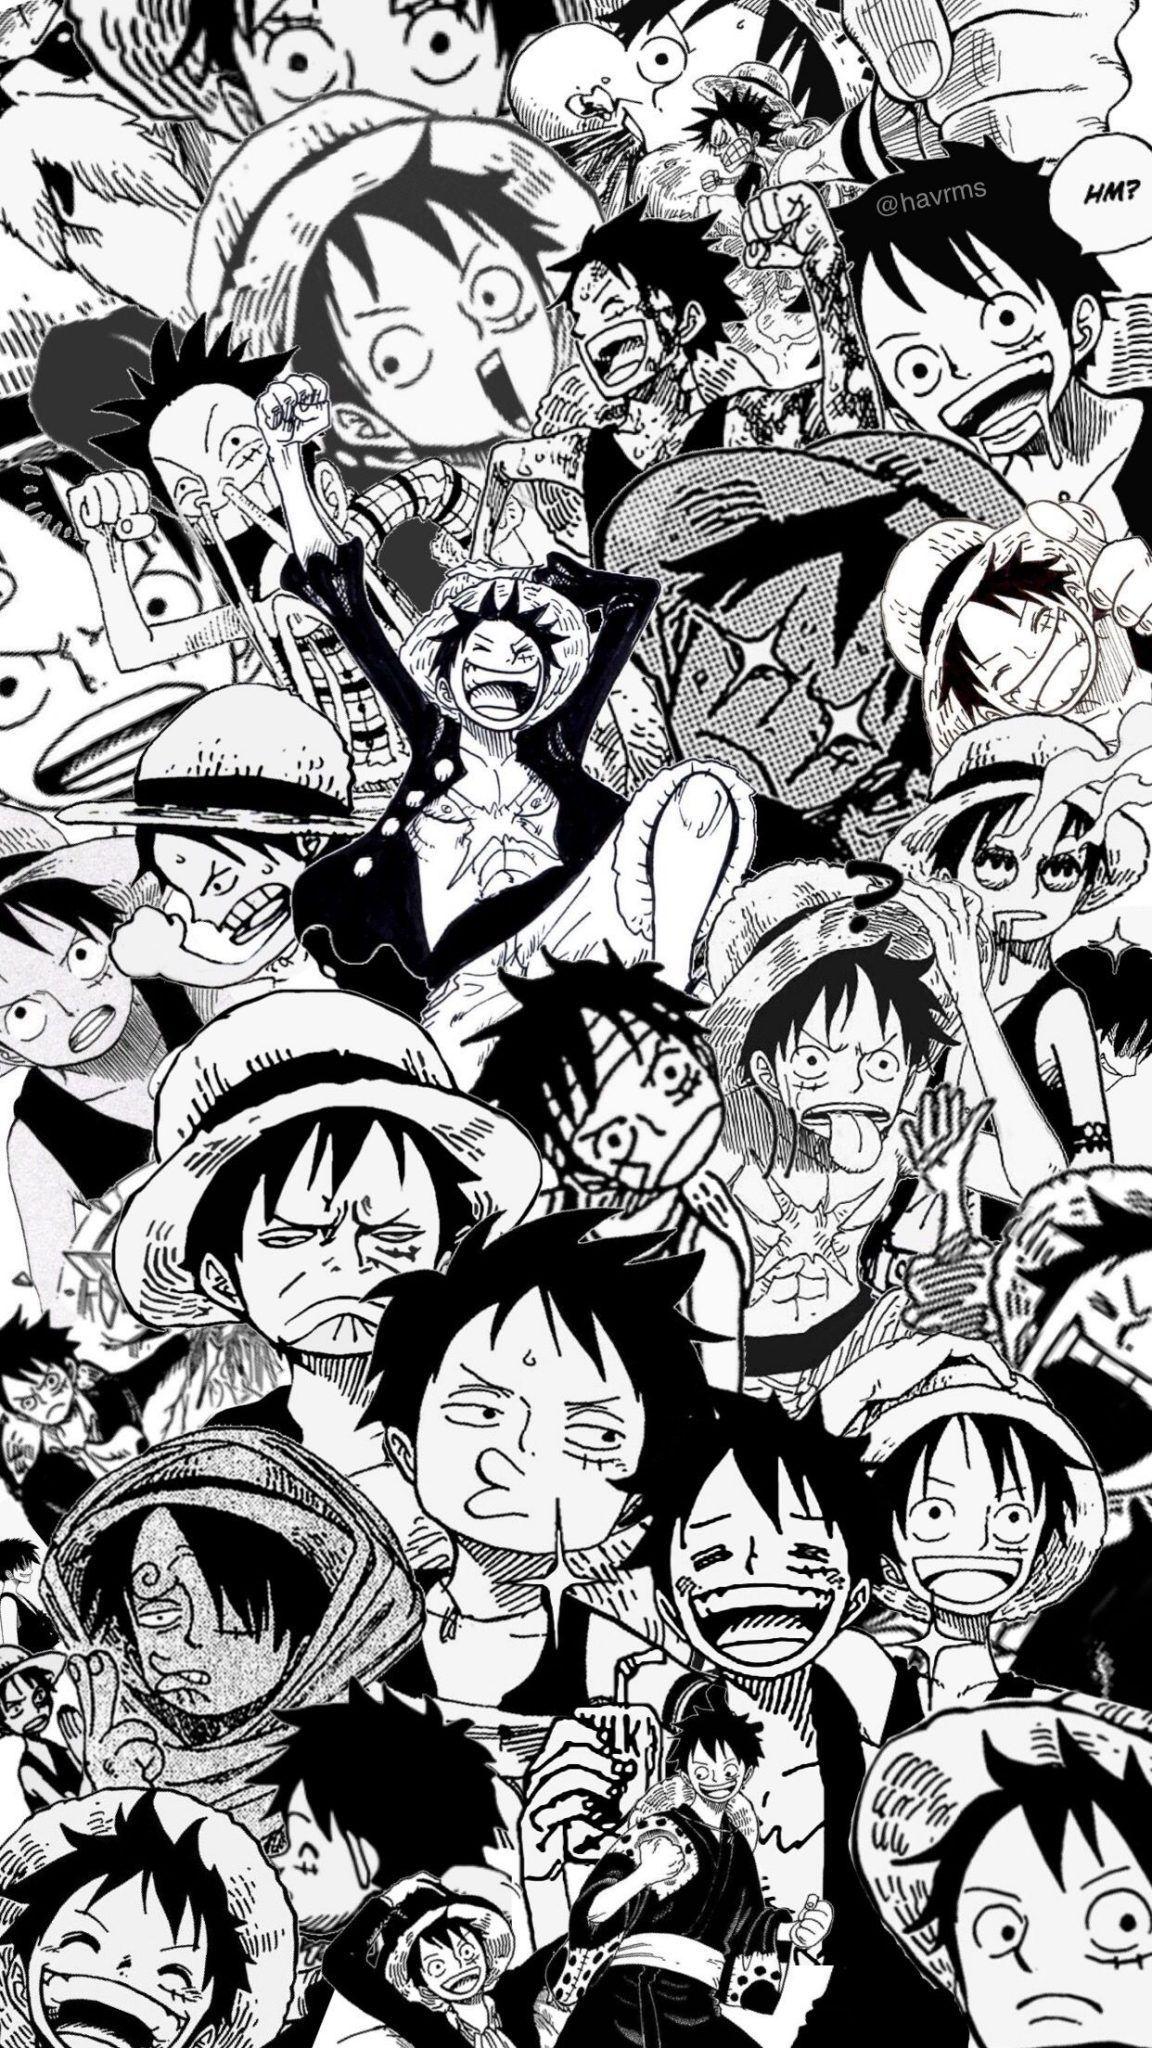 ïンピースの壁紙hdと4k無料ダウンロード In 2020 Manga Anime One Piece One Piece Wallpaper Iphone One Piece Comic